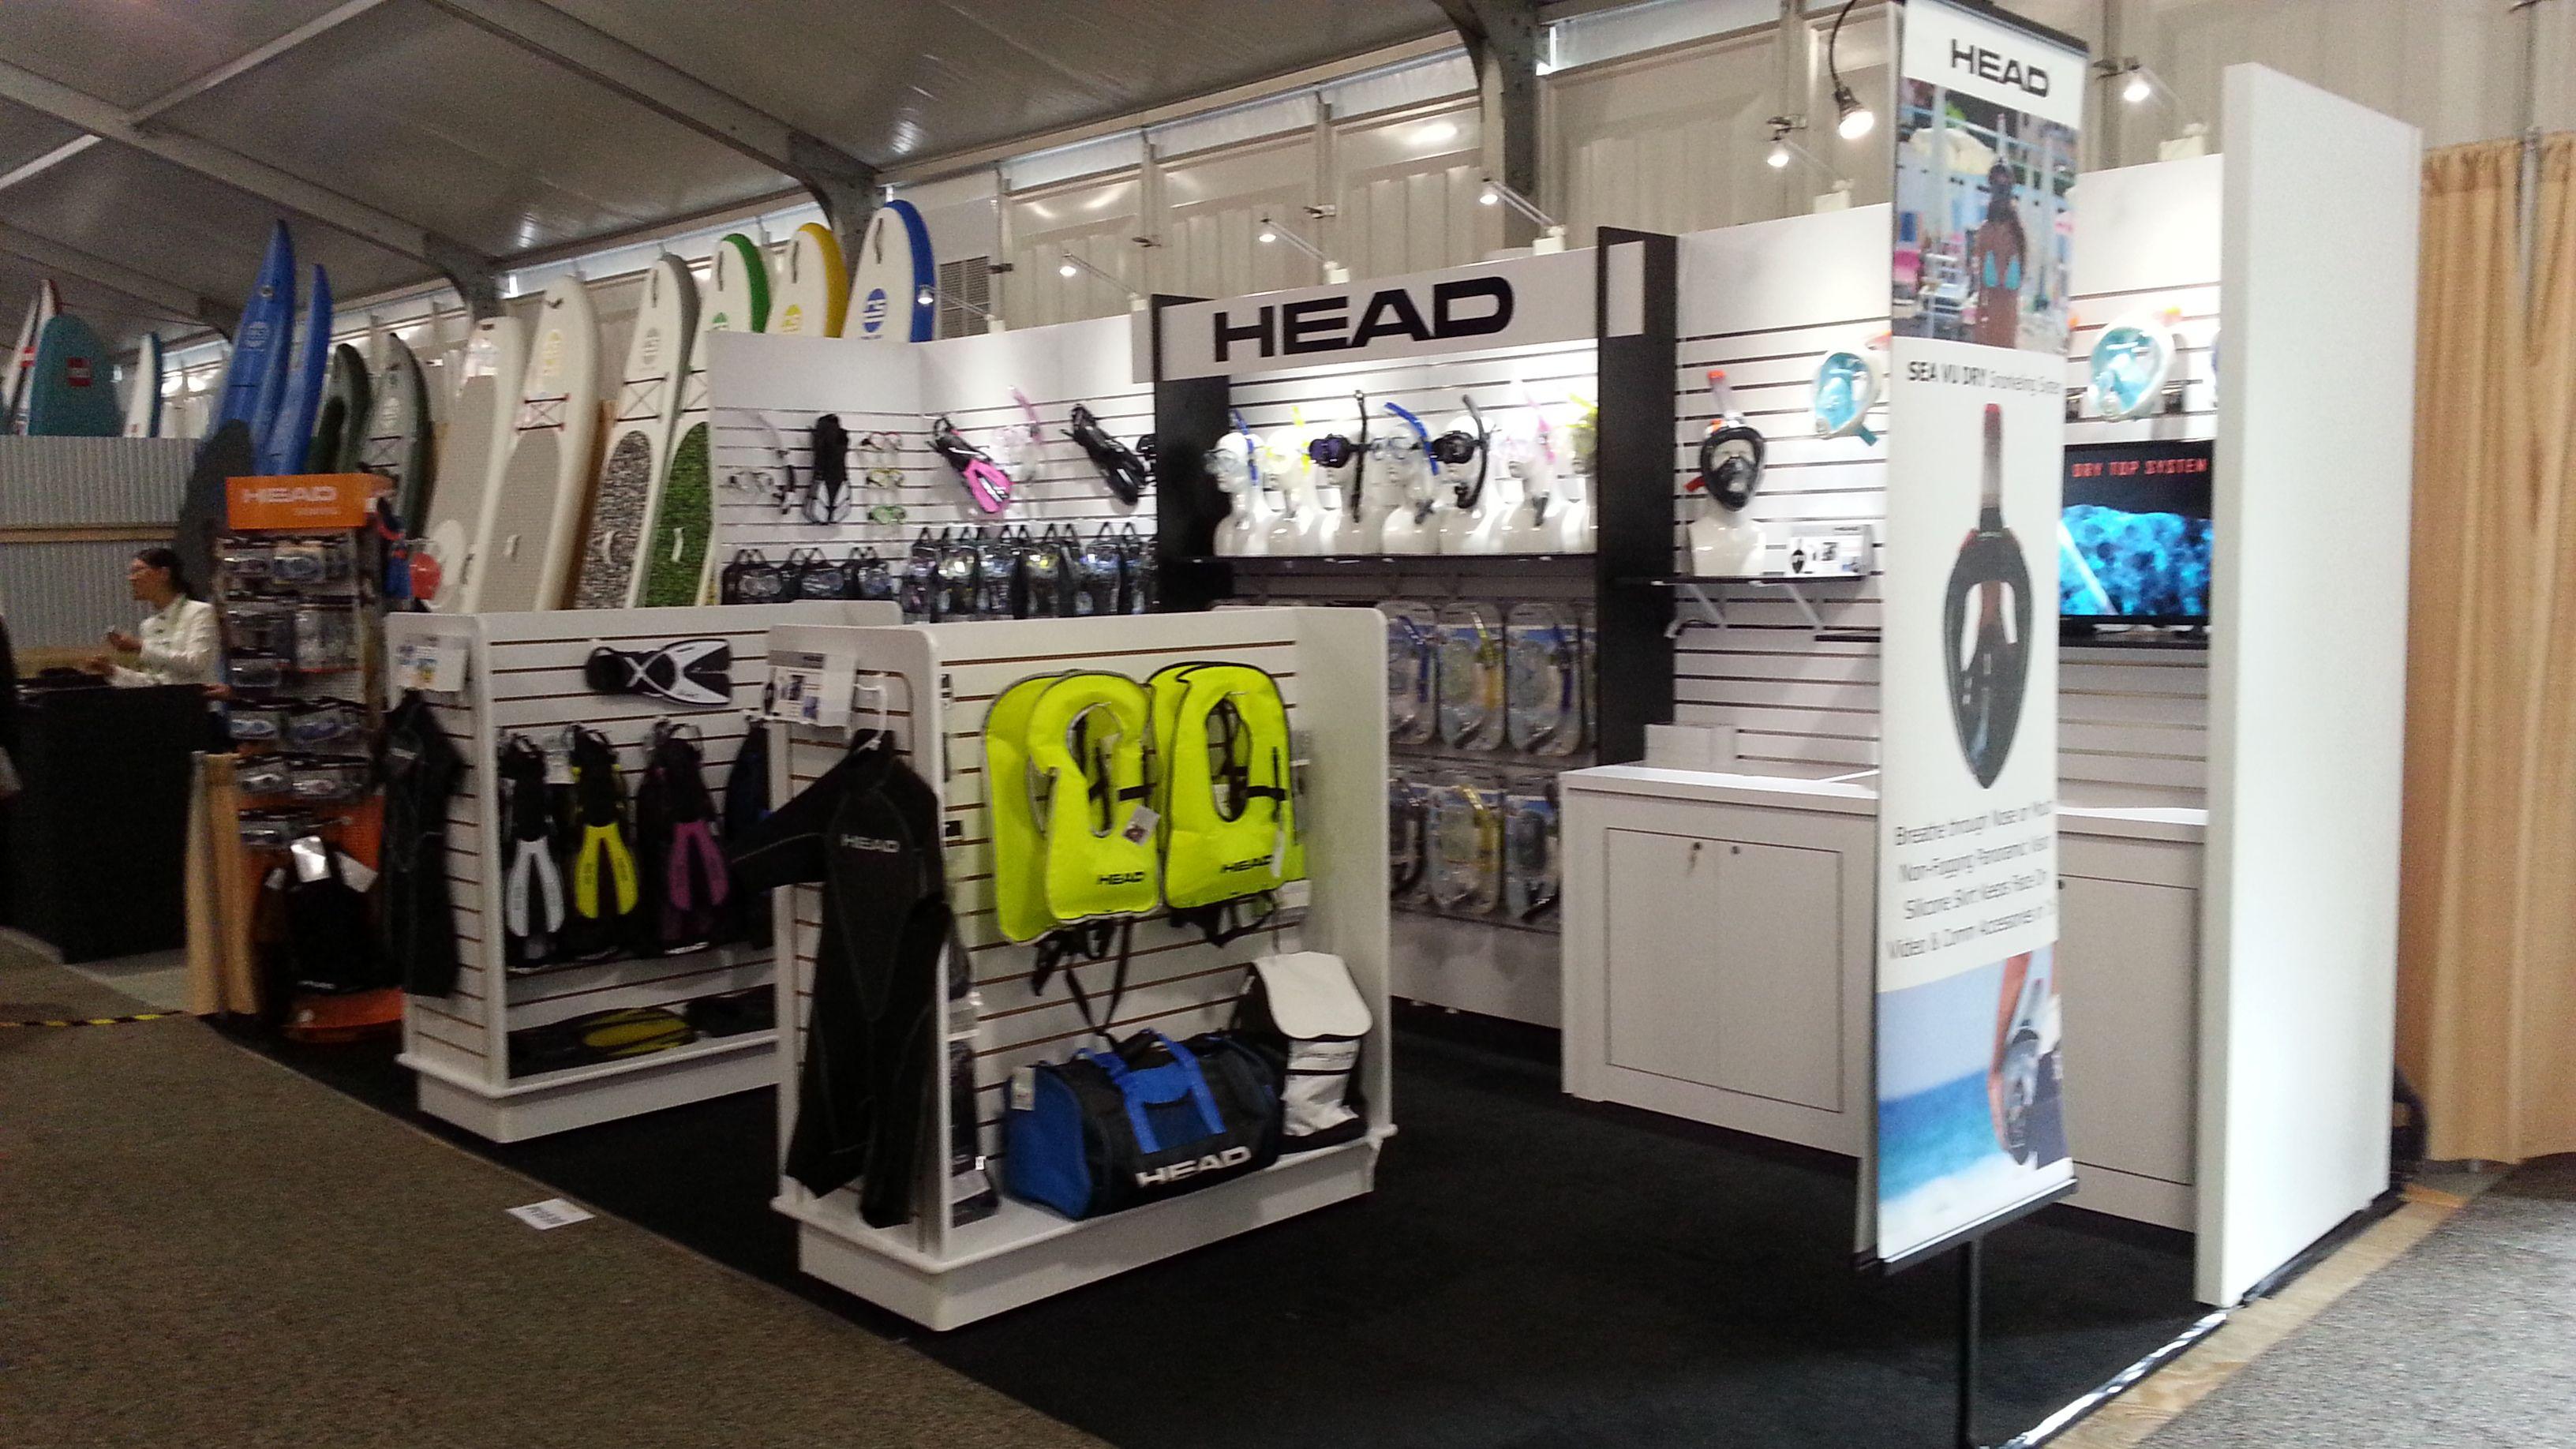 Xylea Wood Custom Slatwall Exhibit For Merchandising Guardian Scuba Trade Show Display Slat Wall Display Booth Design